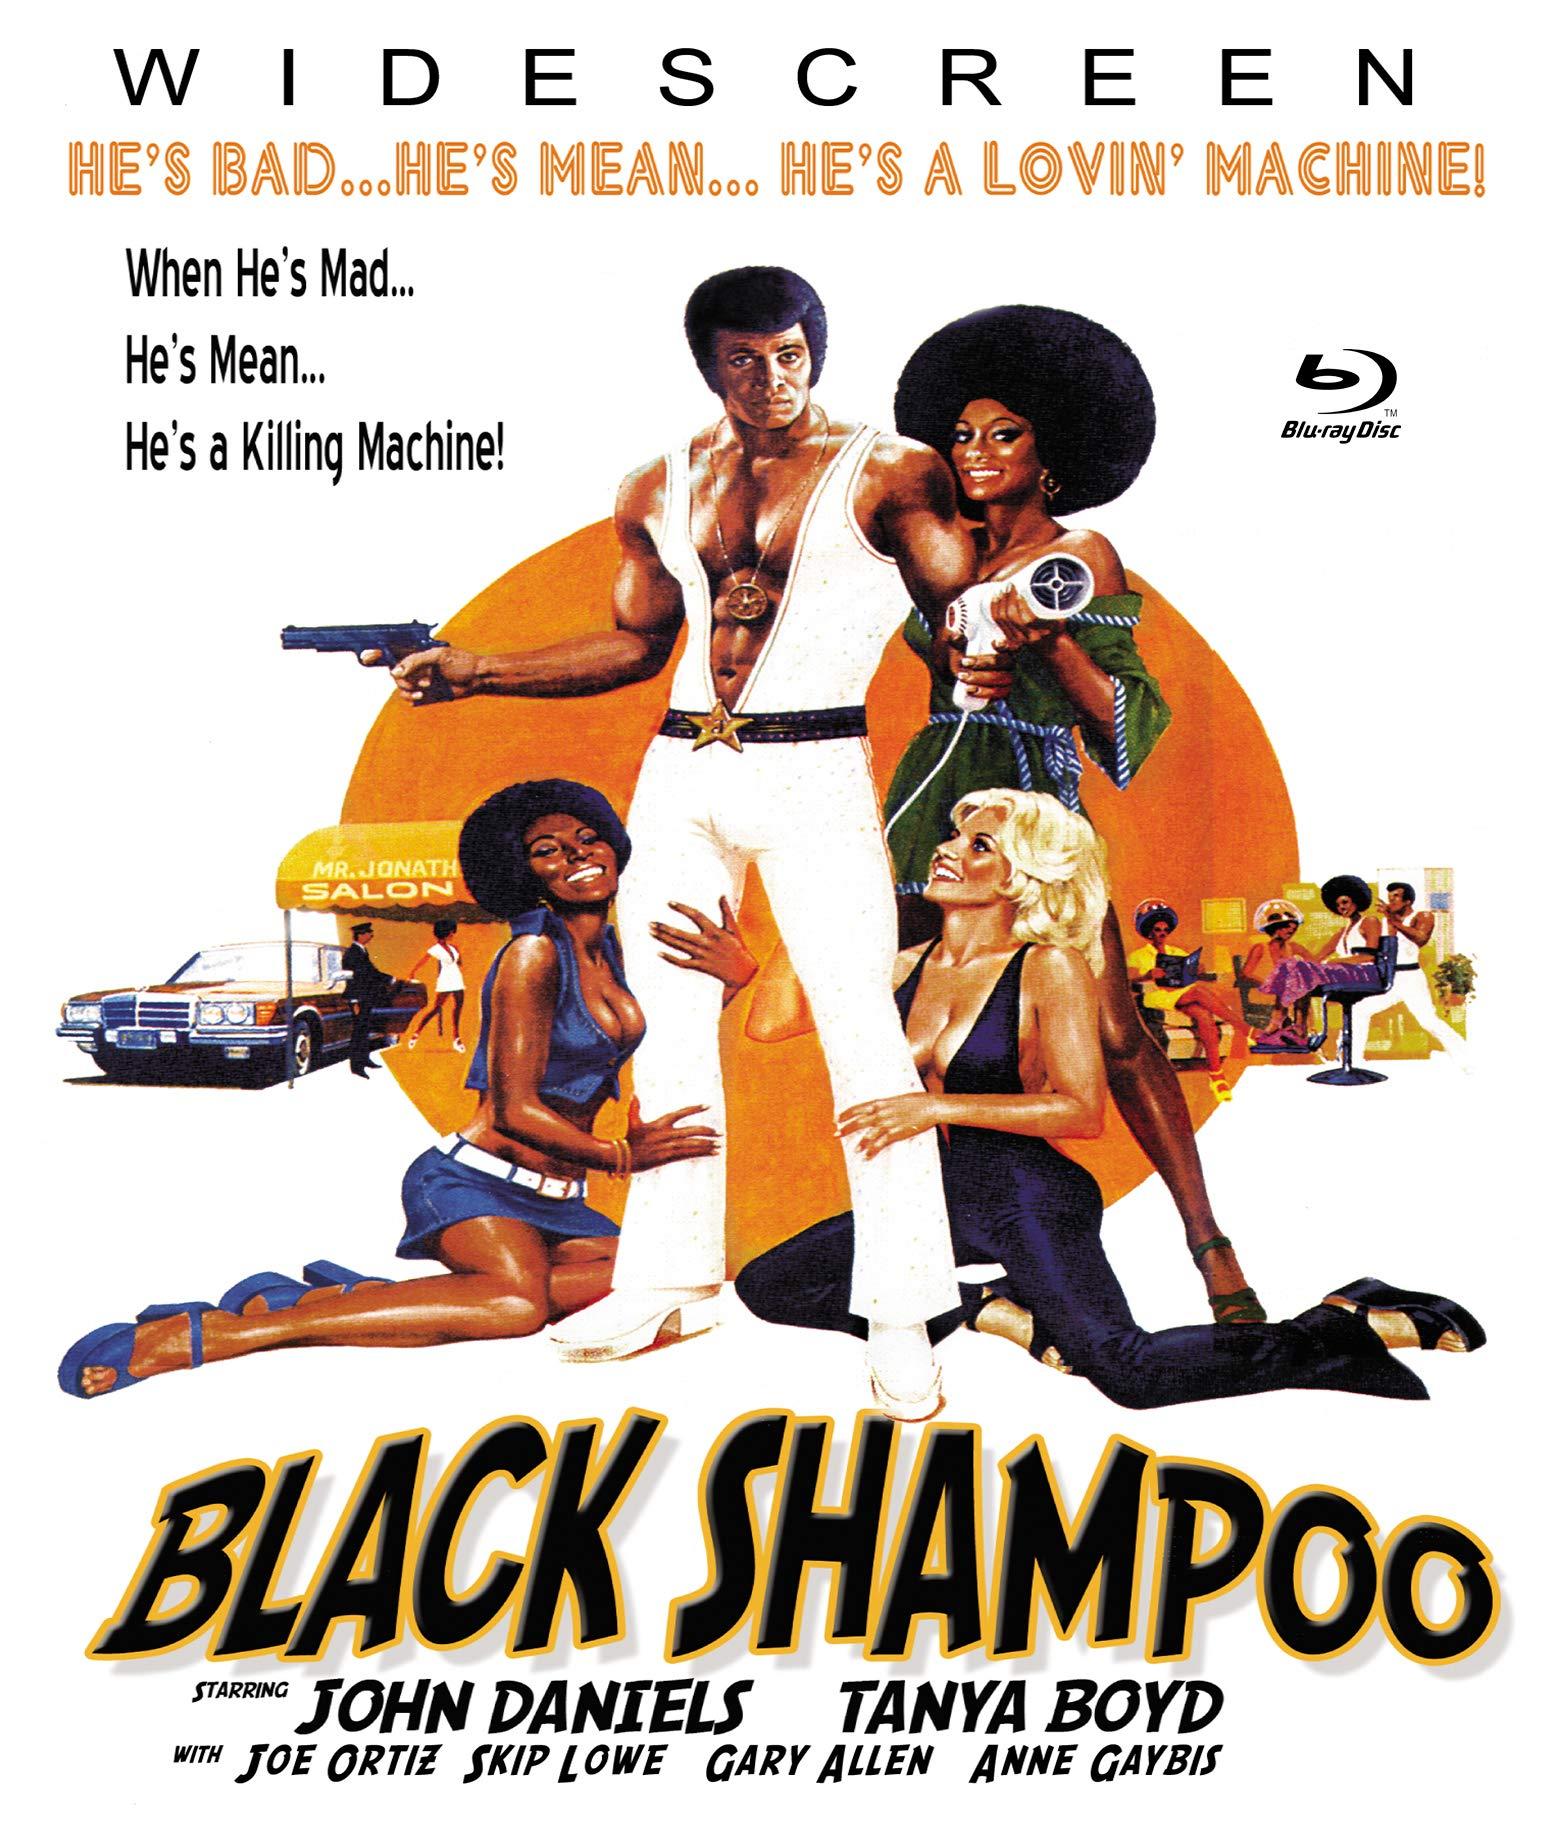 Blu-ray : Black Shampoo (With DVD)